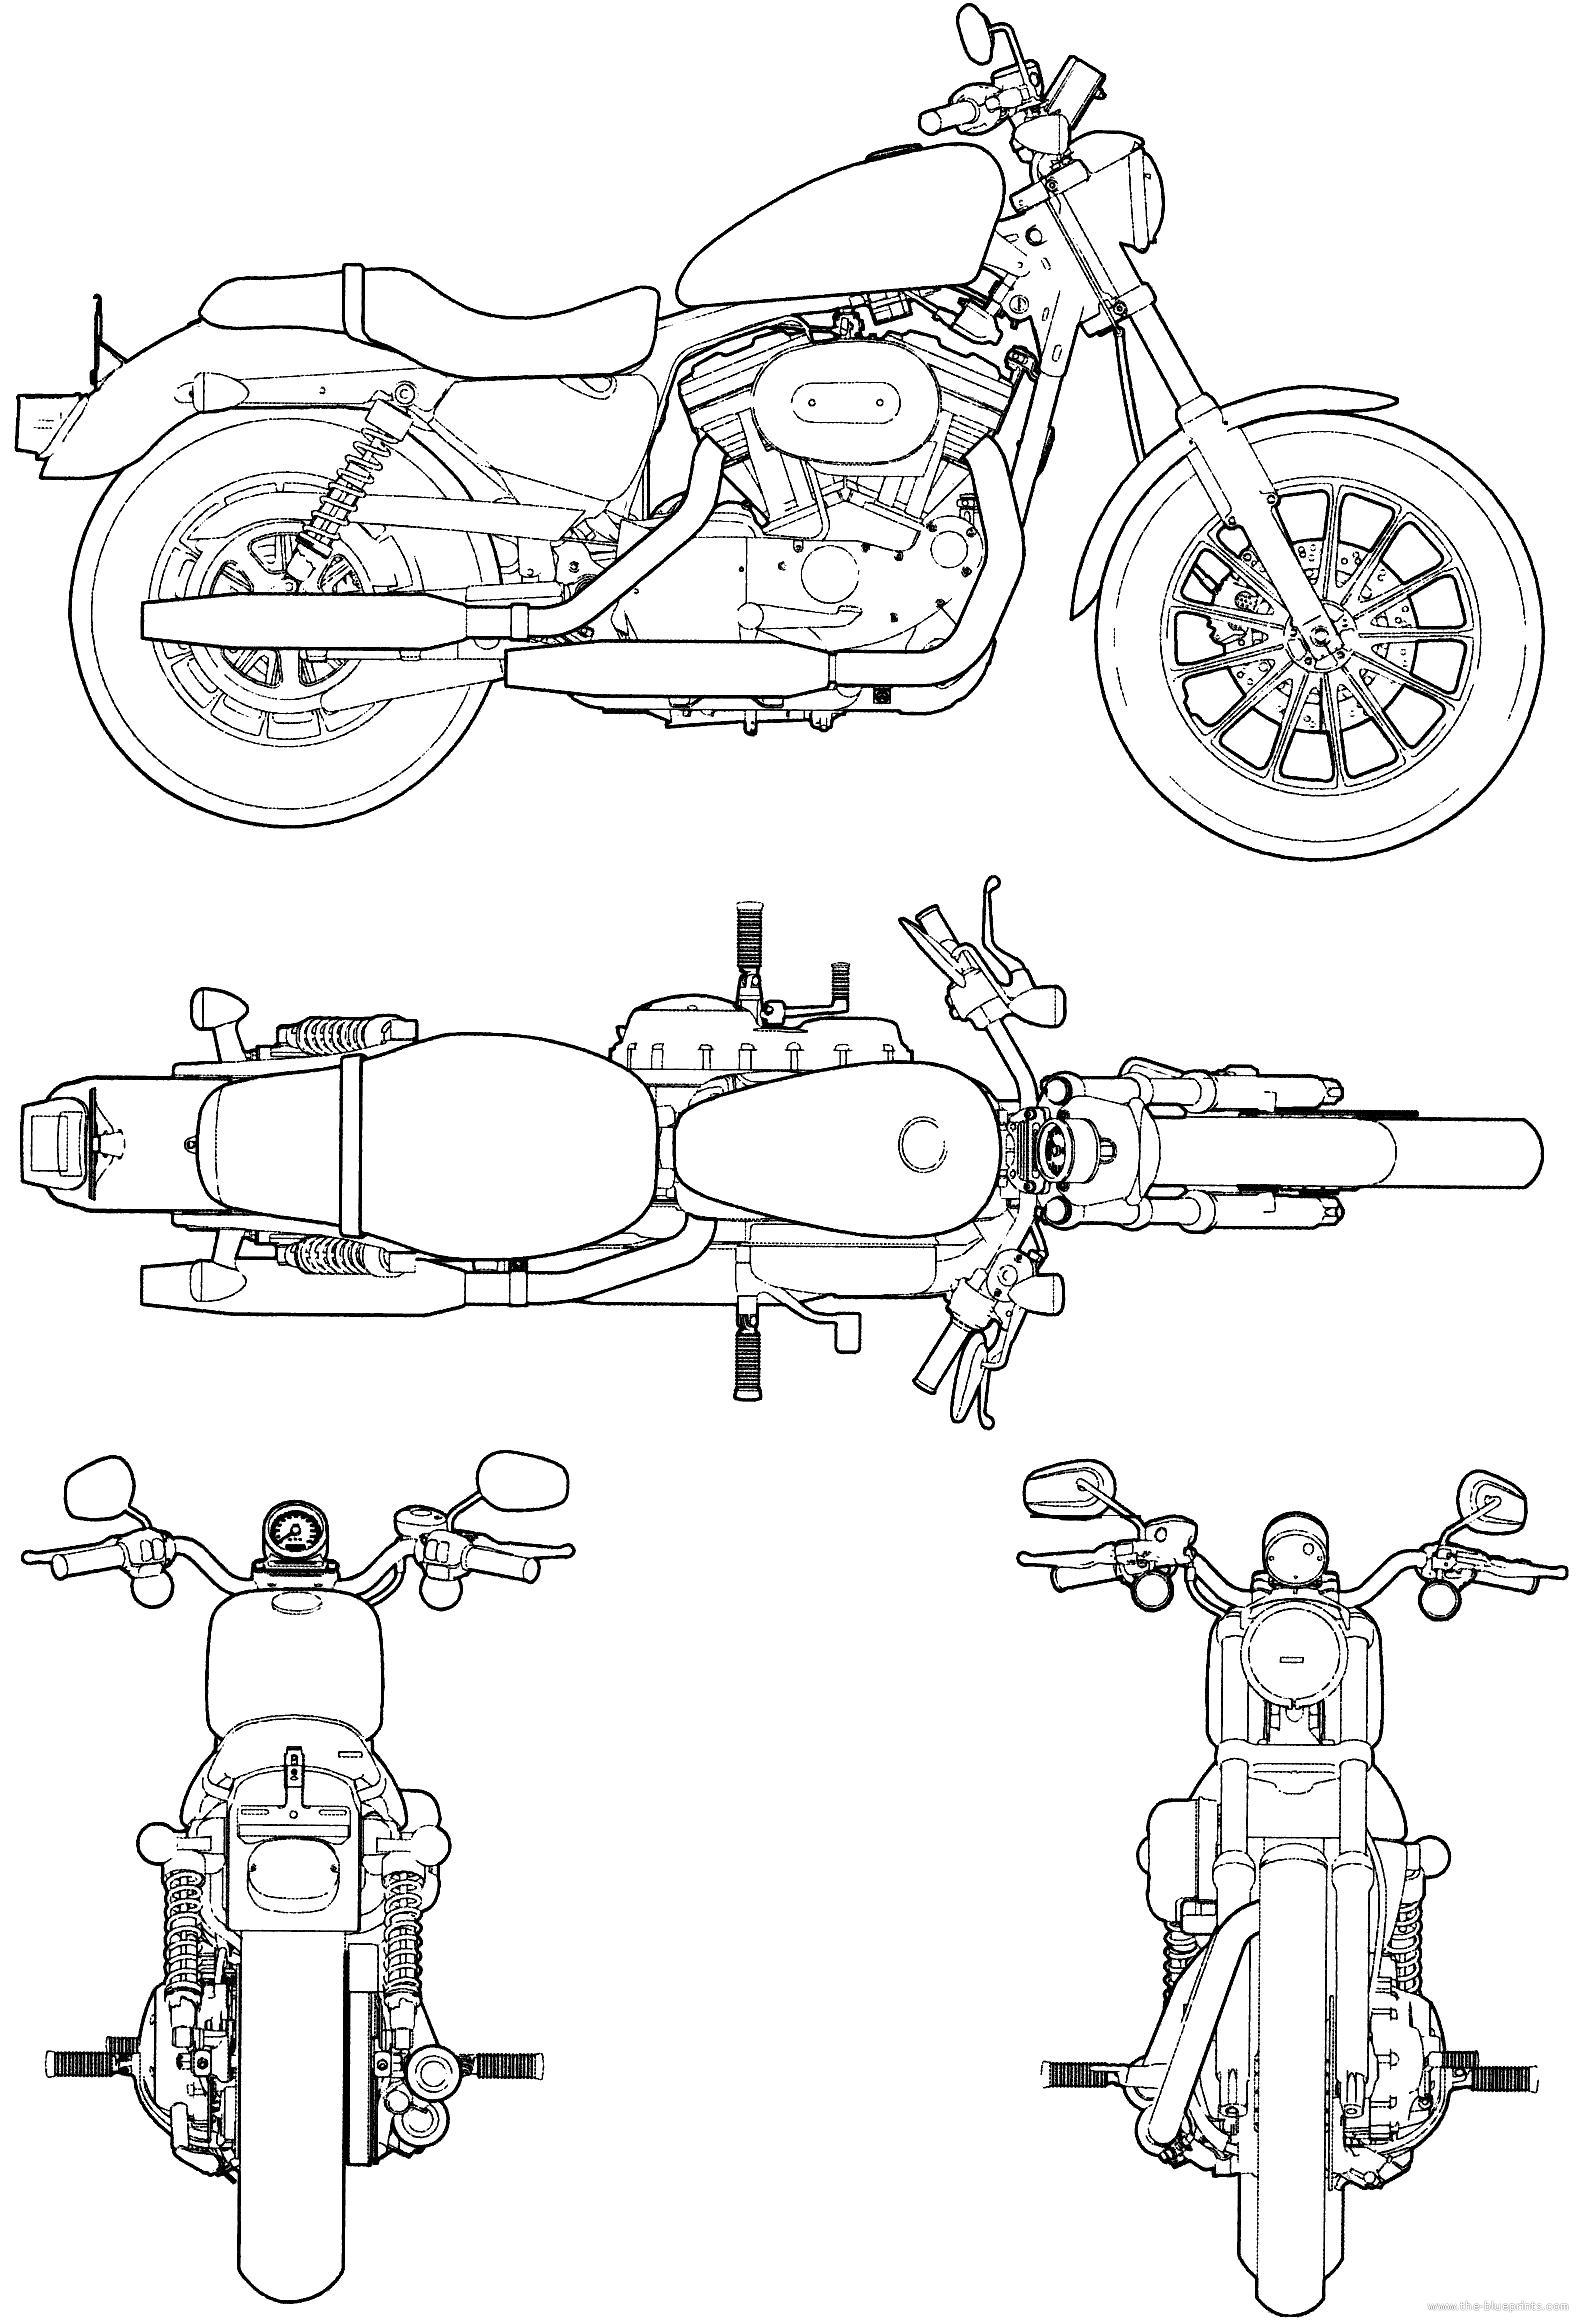 harley-davidson xlh 53c blueprints free